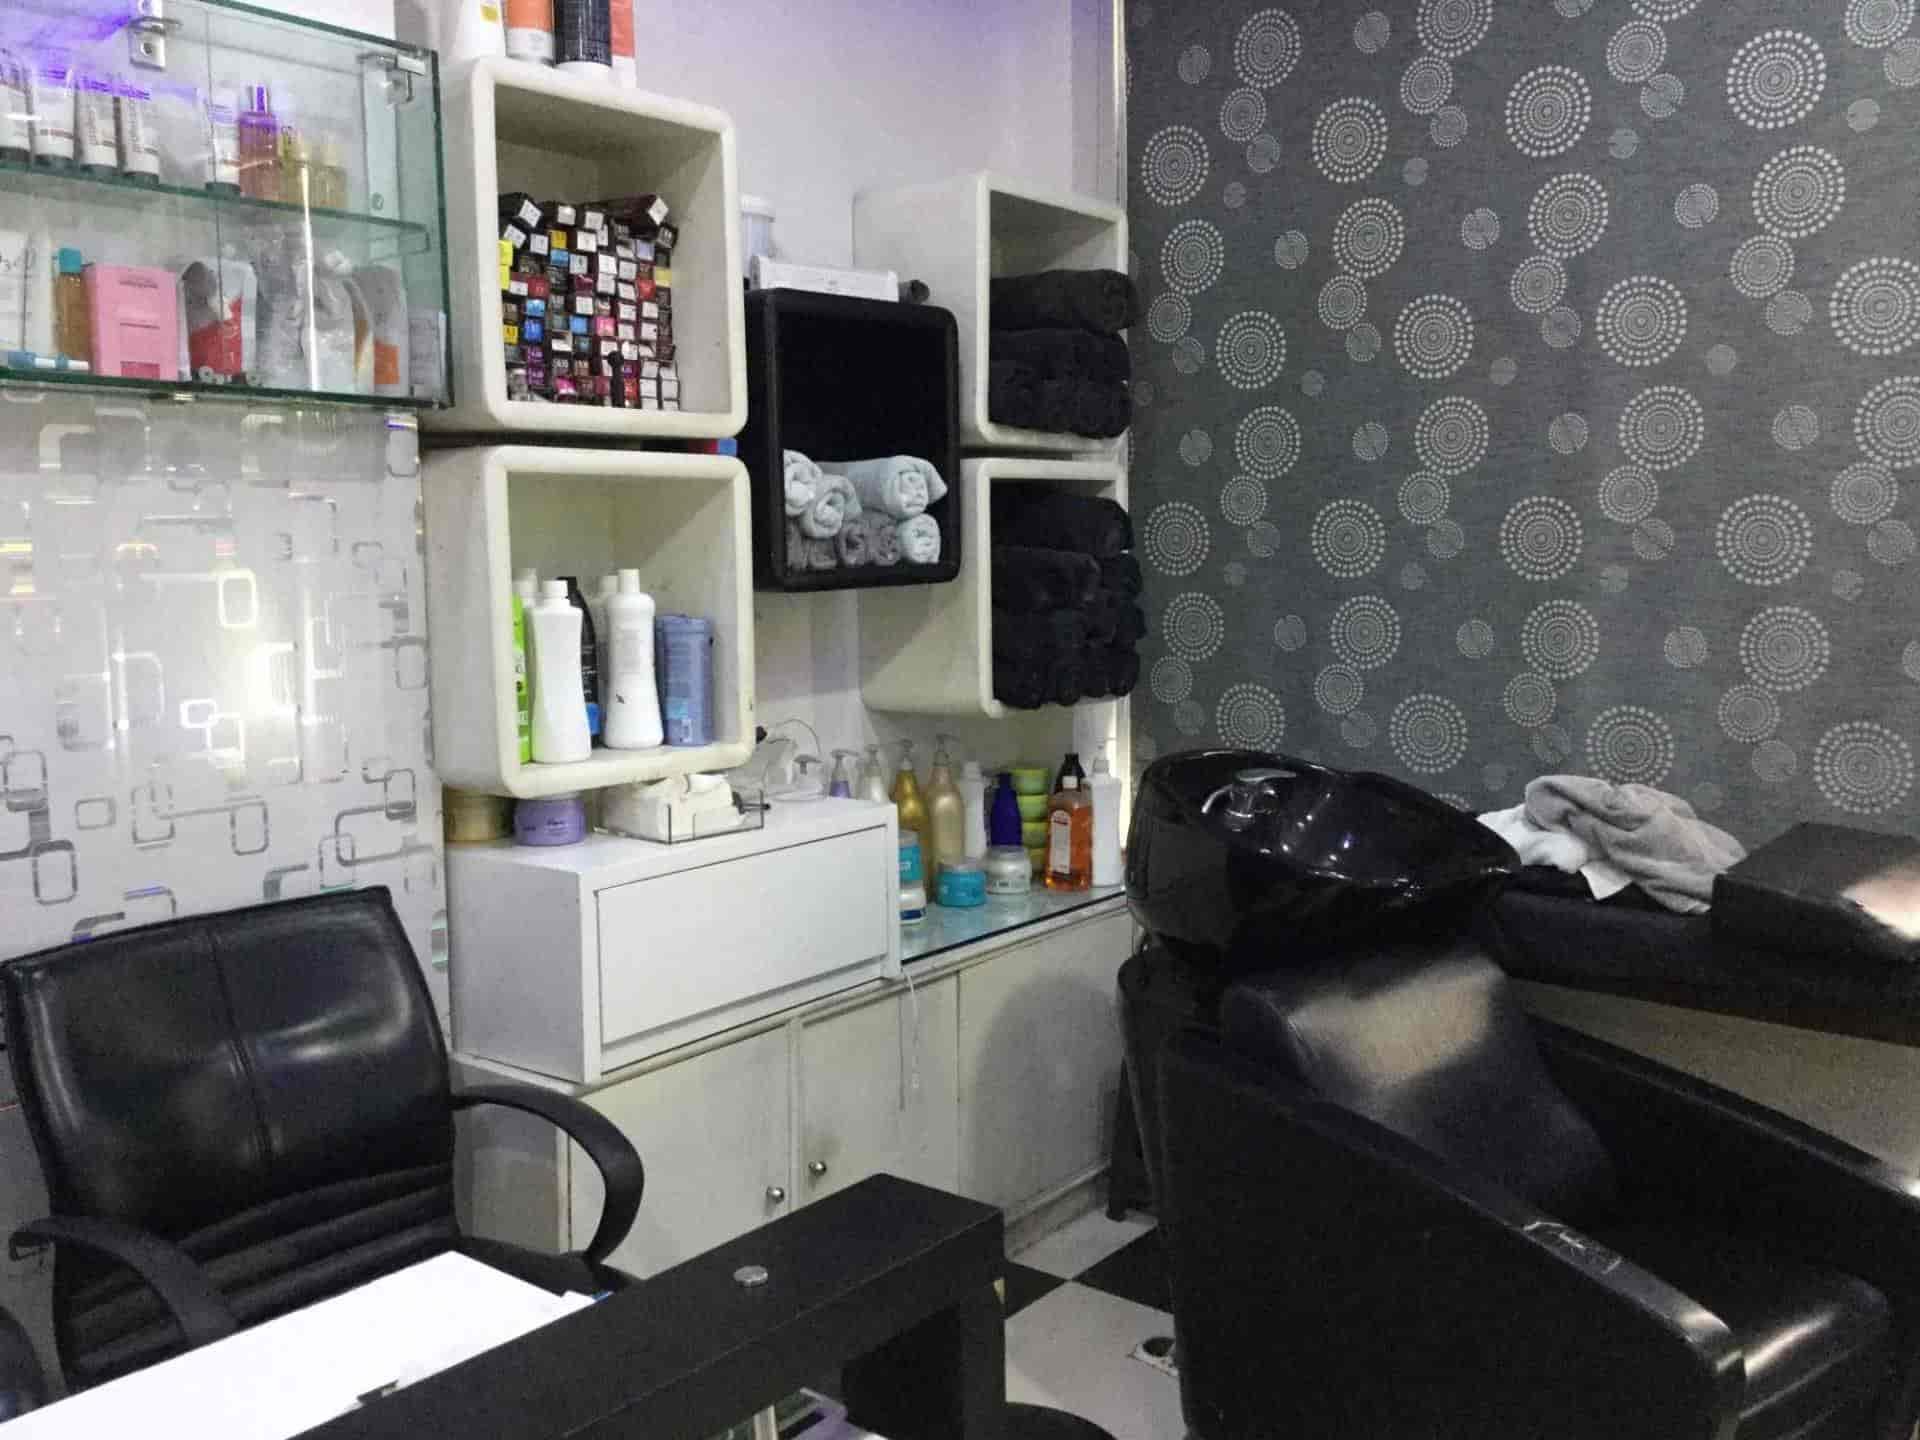 studio equipment · lmntrix salon makeup studio photos sector 50 noida beauty salon equipment repair ...